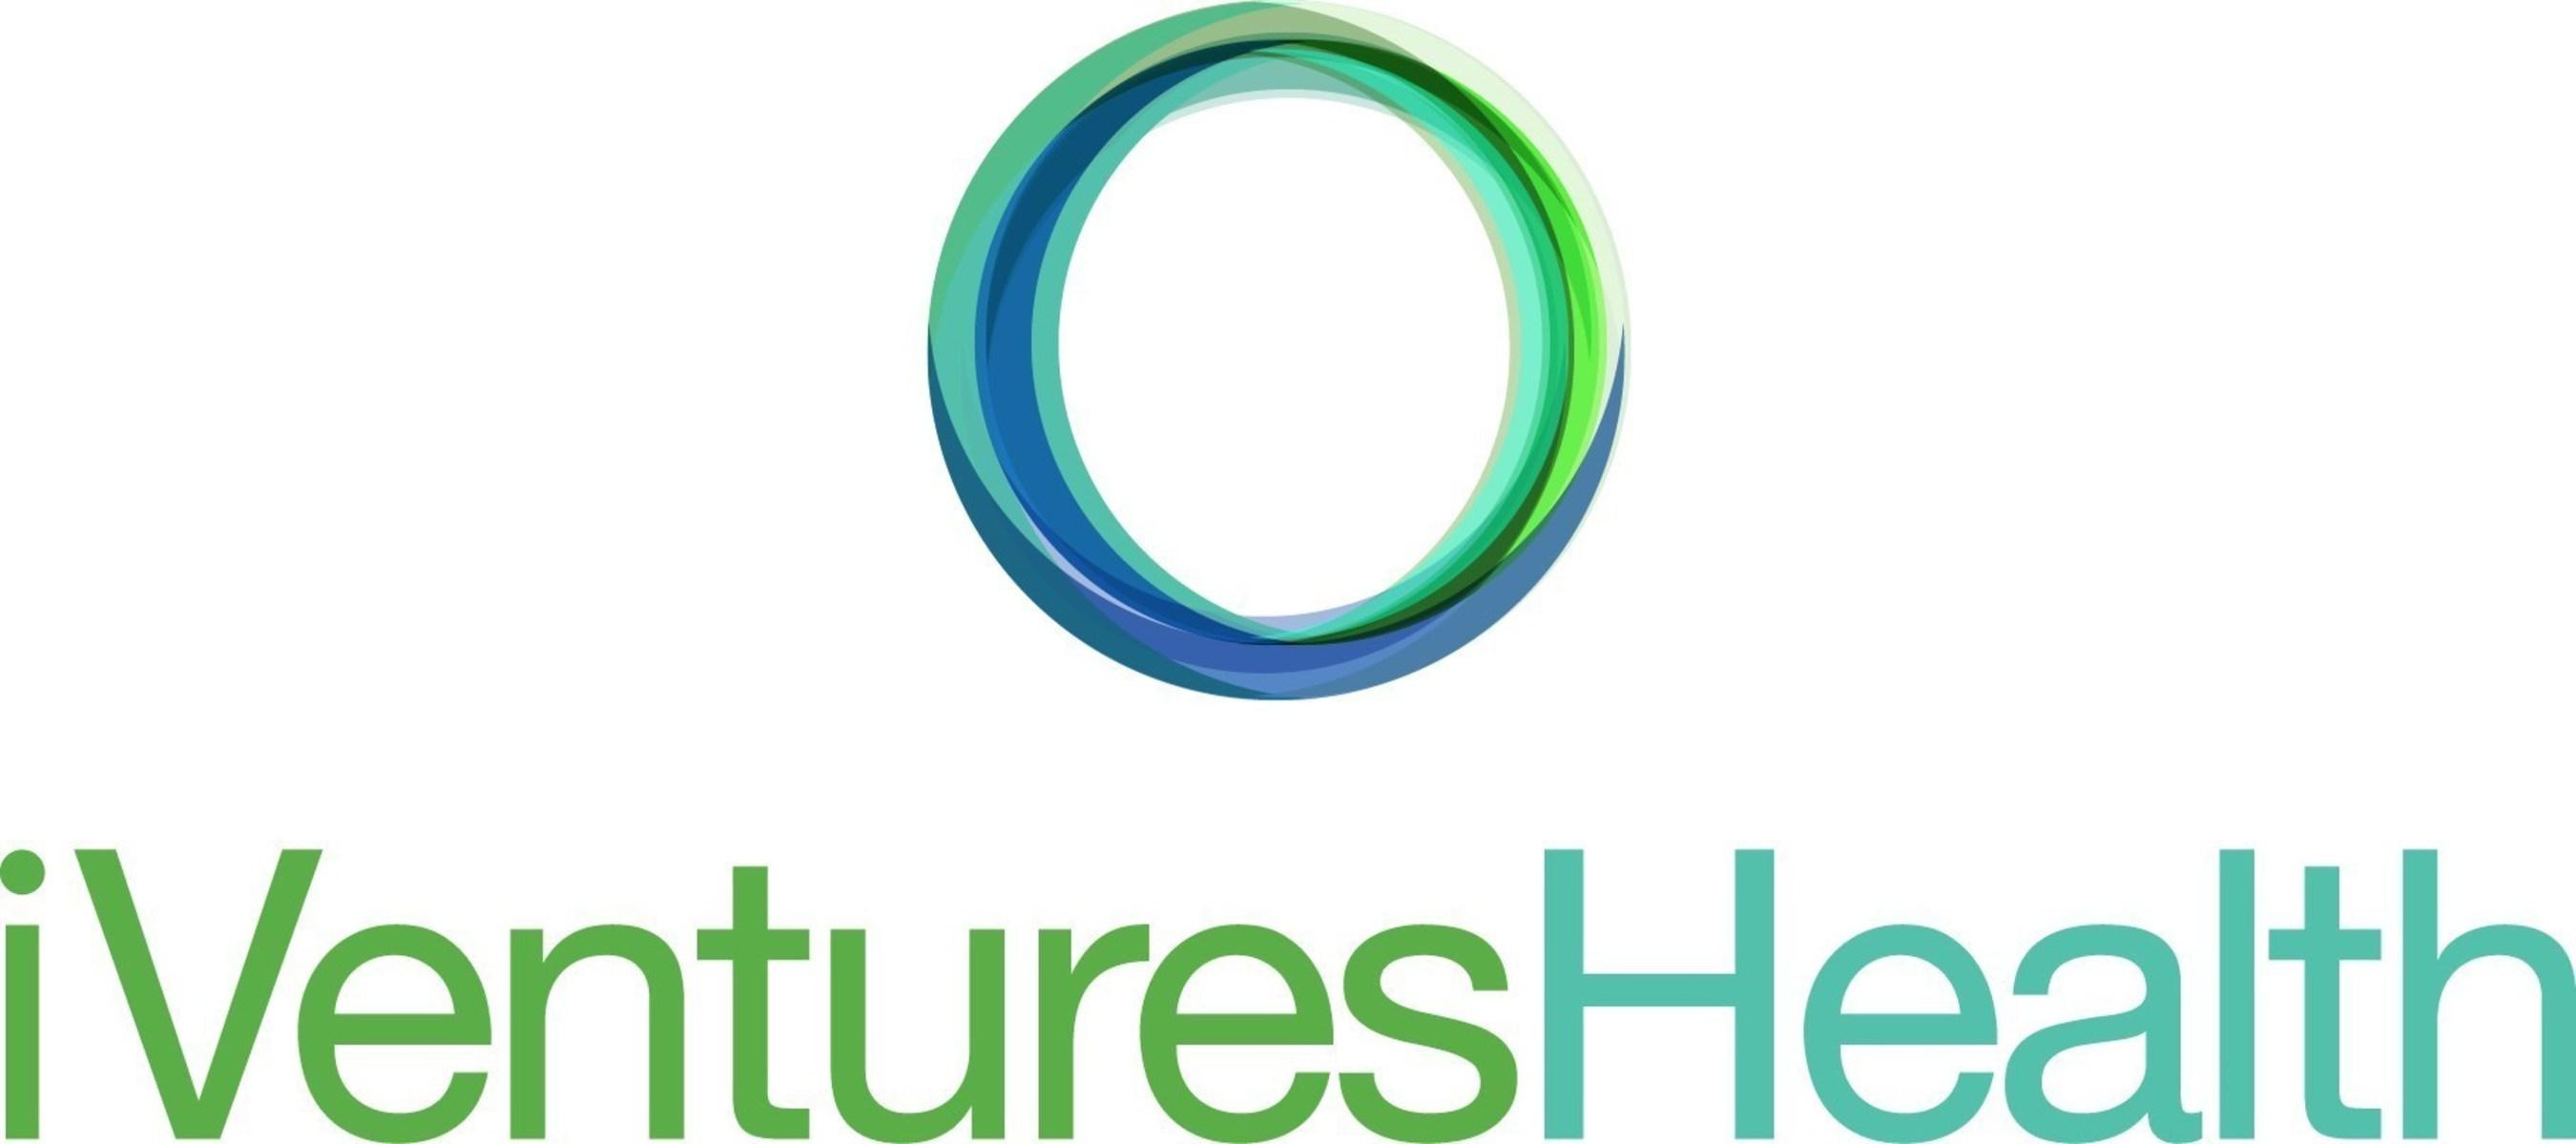 iVenturesHealth logo